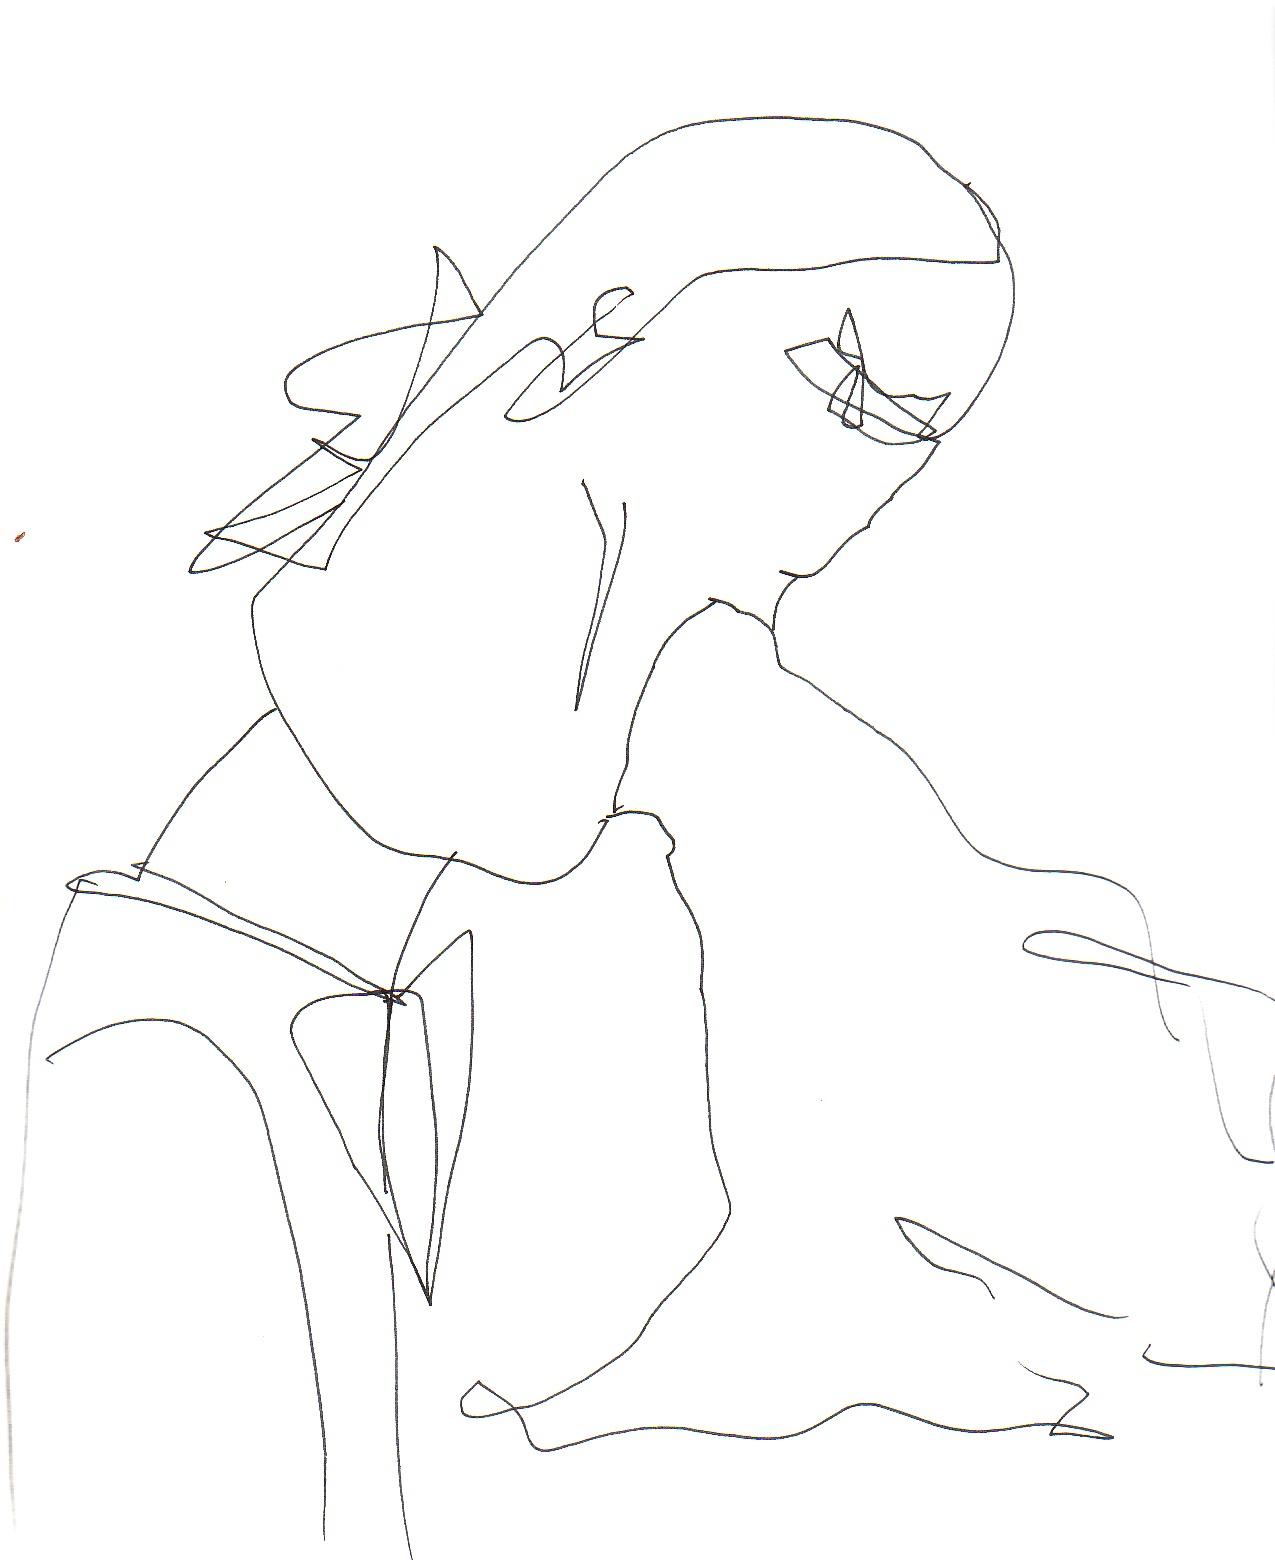 Gabriela-Sanchez-Drawing25.jpg